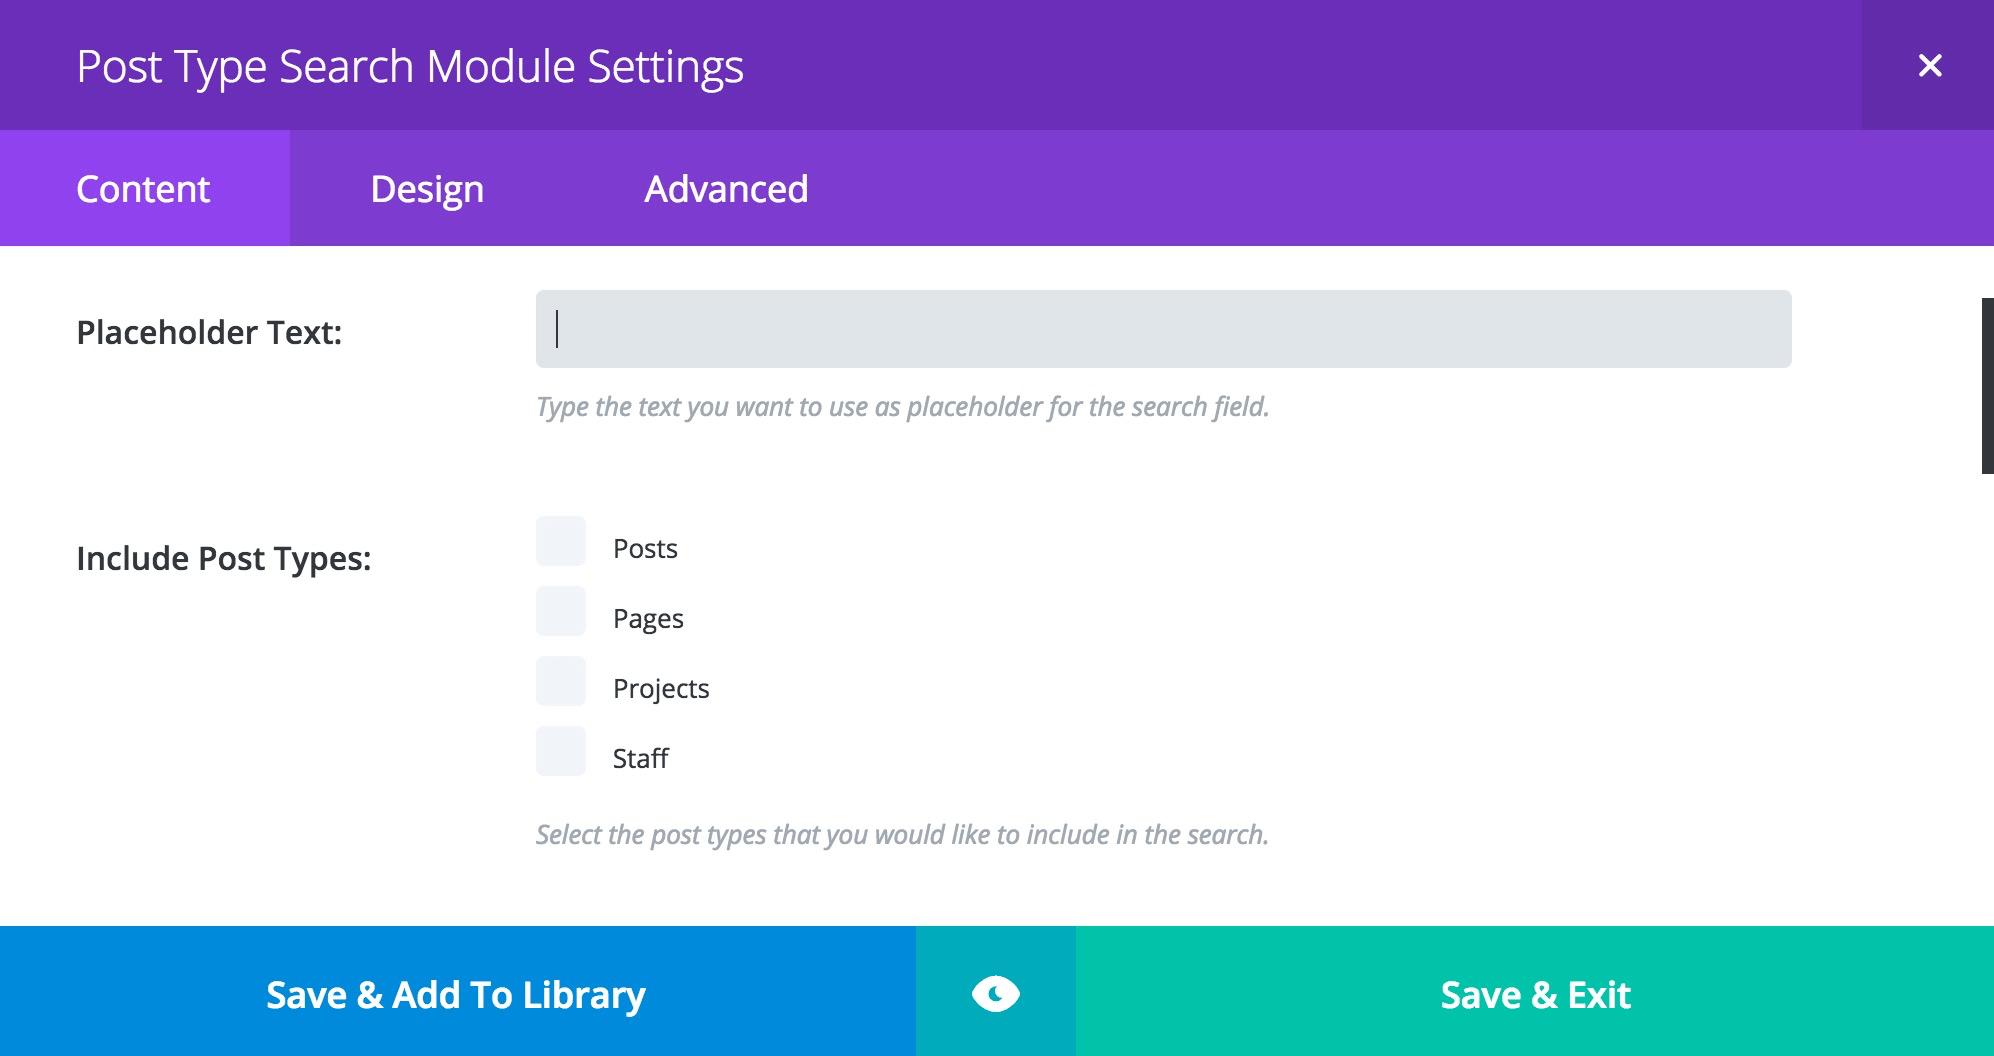 Post Type Search Module Settings